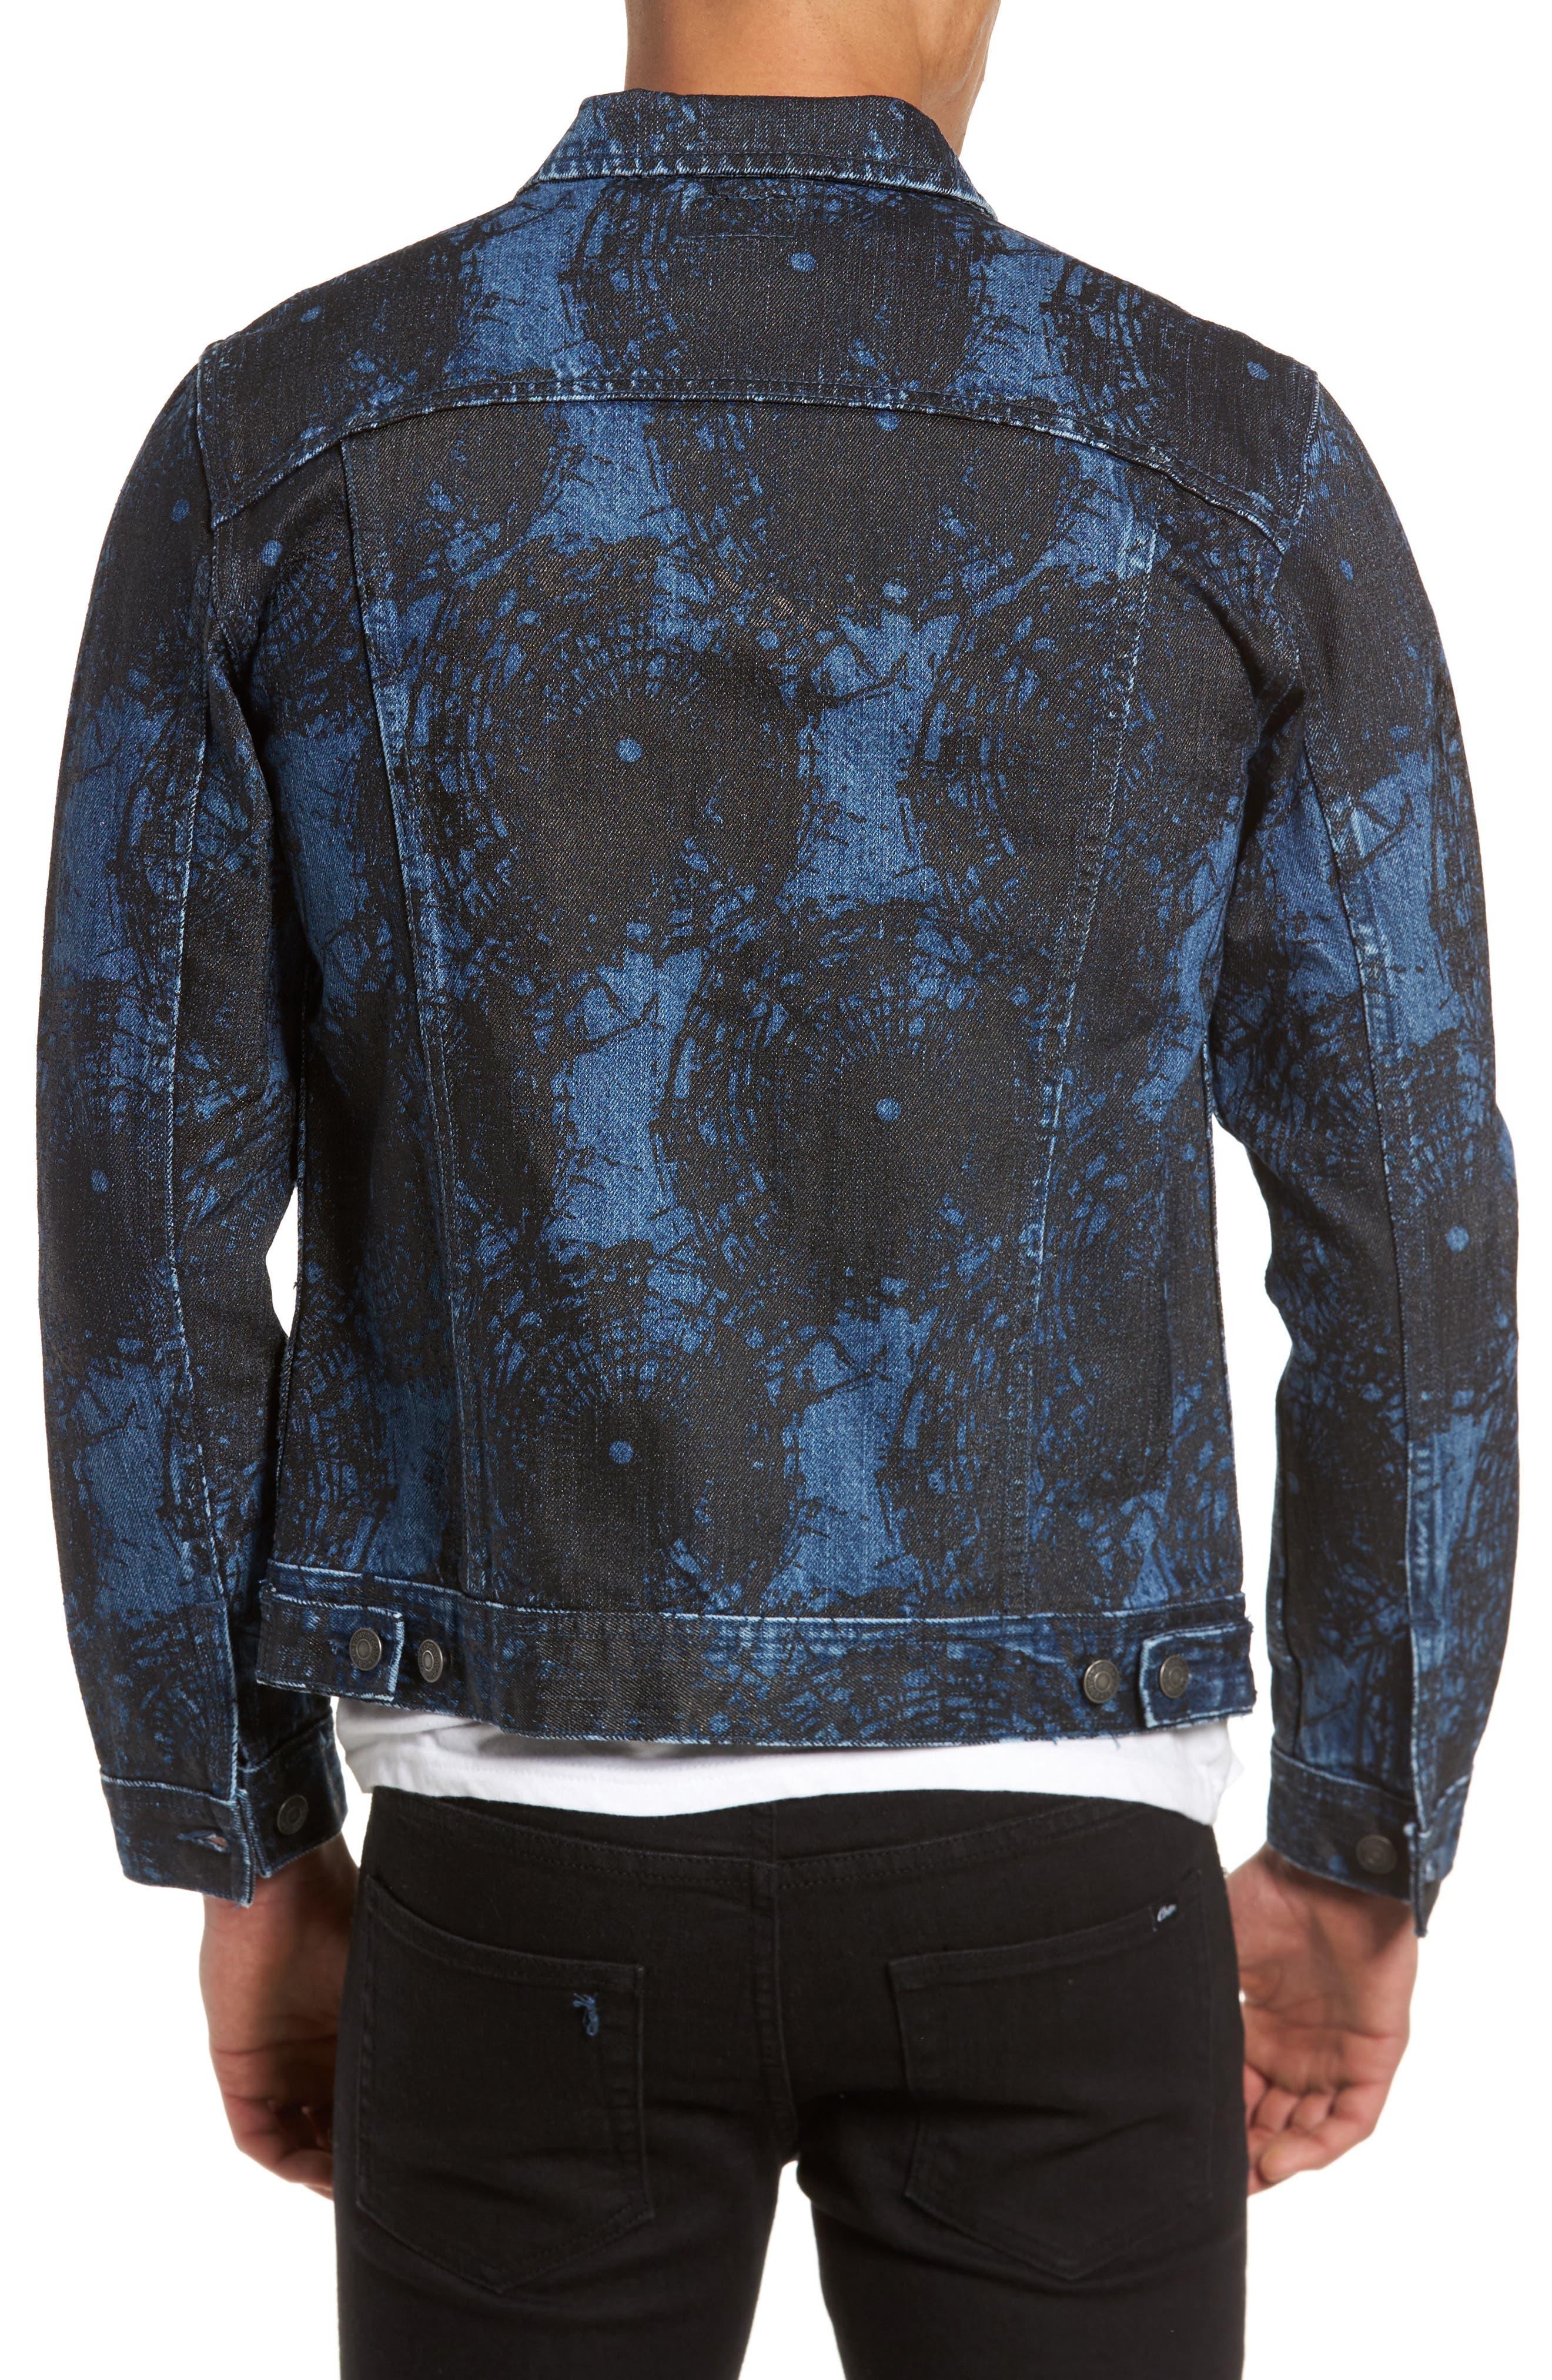 Shattered Denim Jacket,                             Alternate thumbnail 2, color,                             002